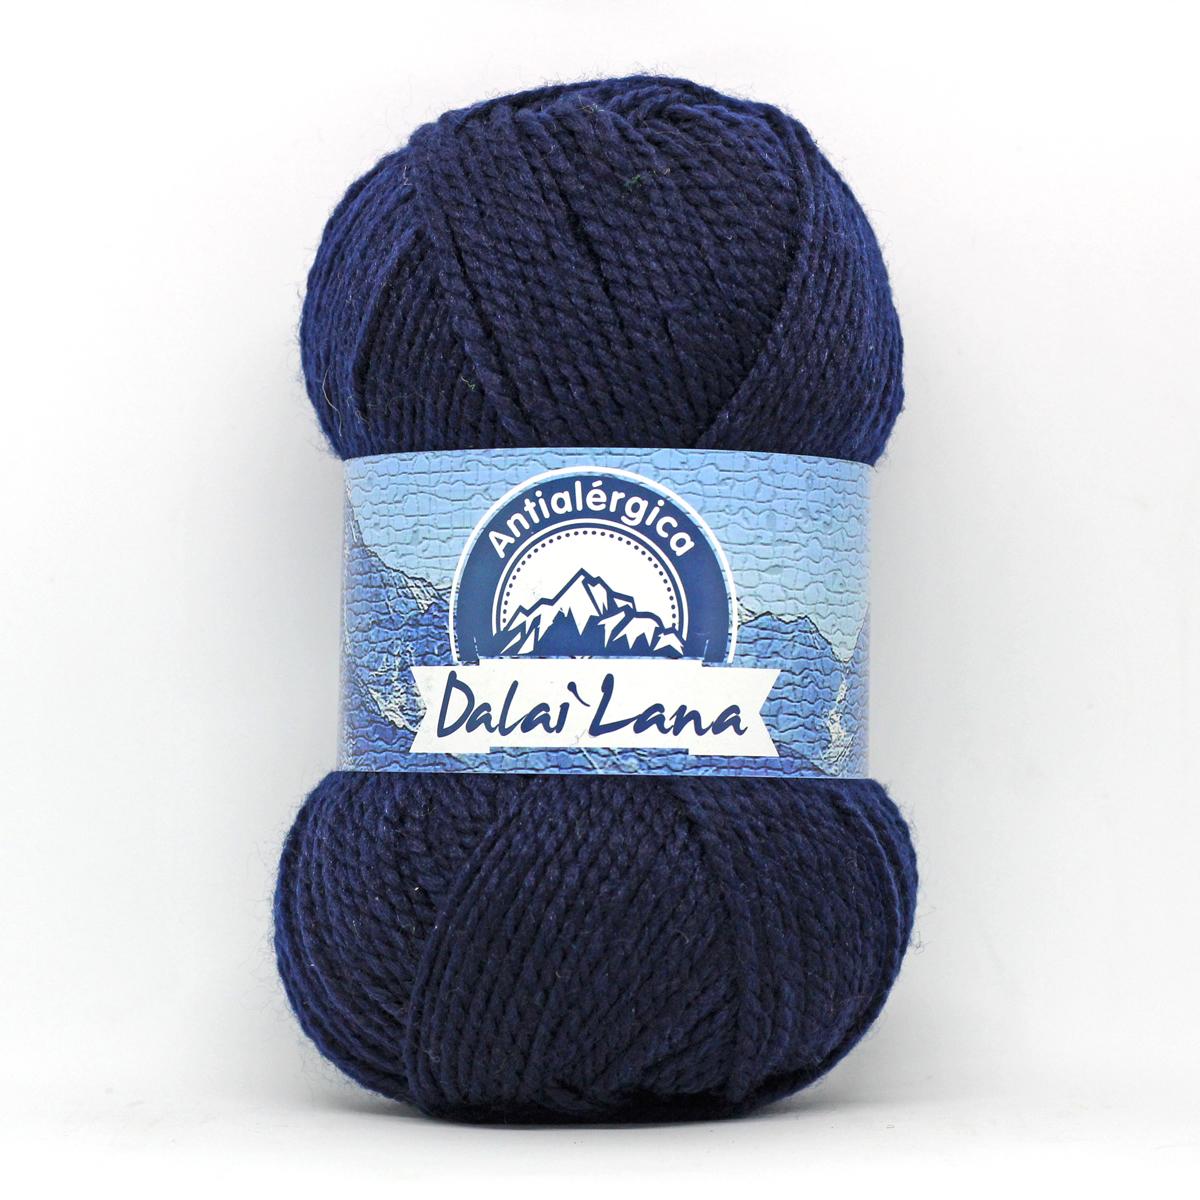 Dalai Lana - 772